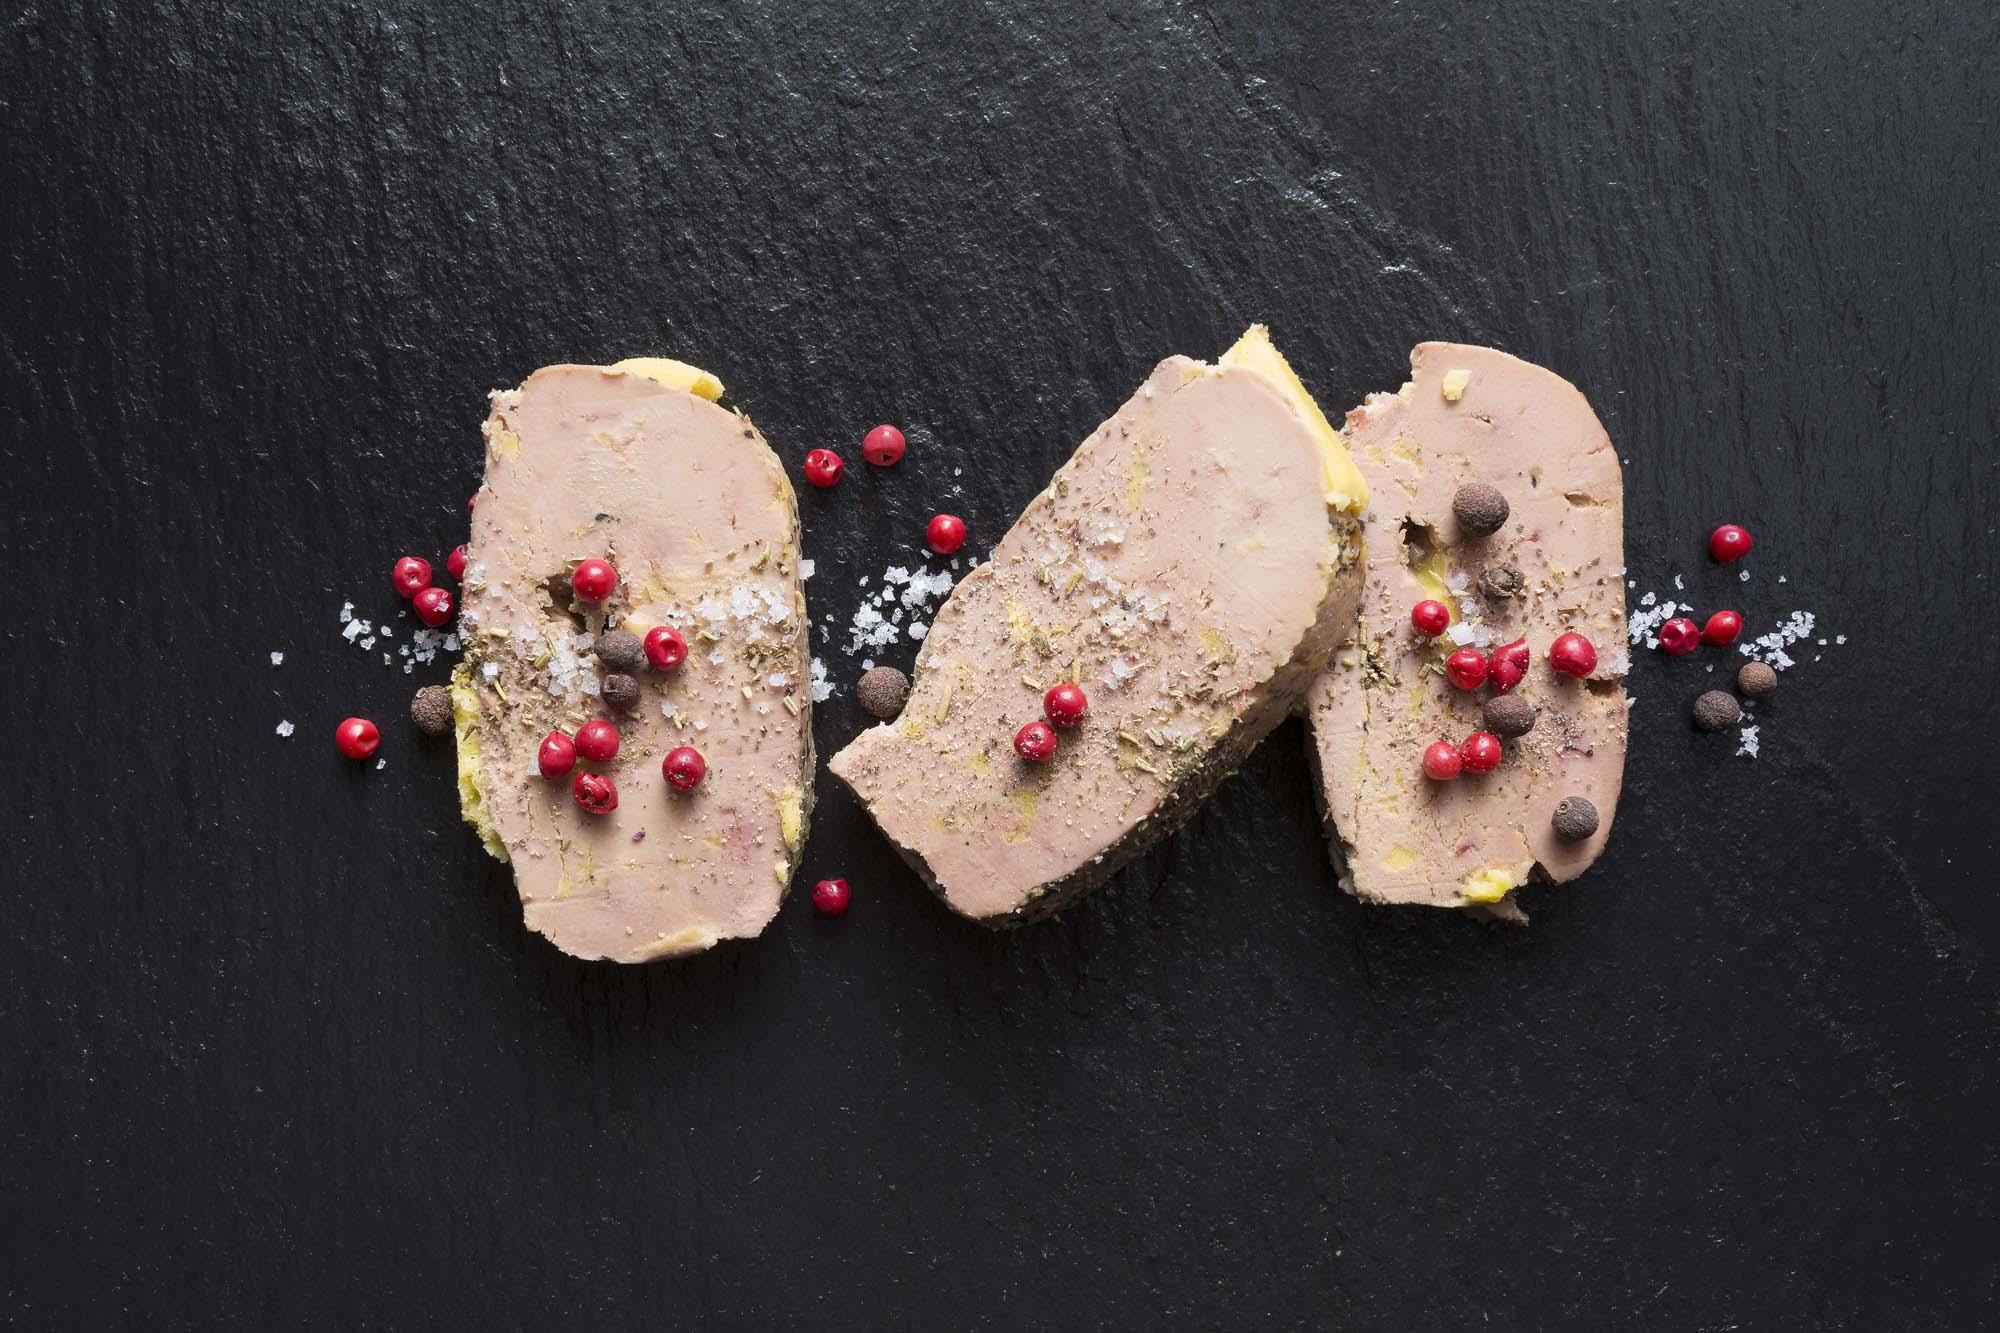 Foie gras a l'orange